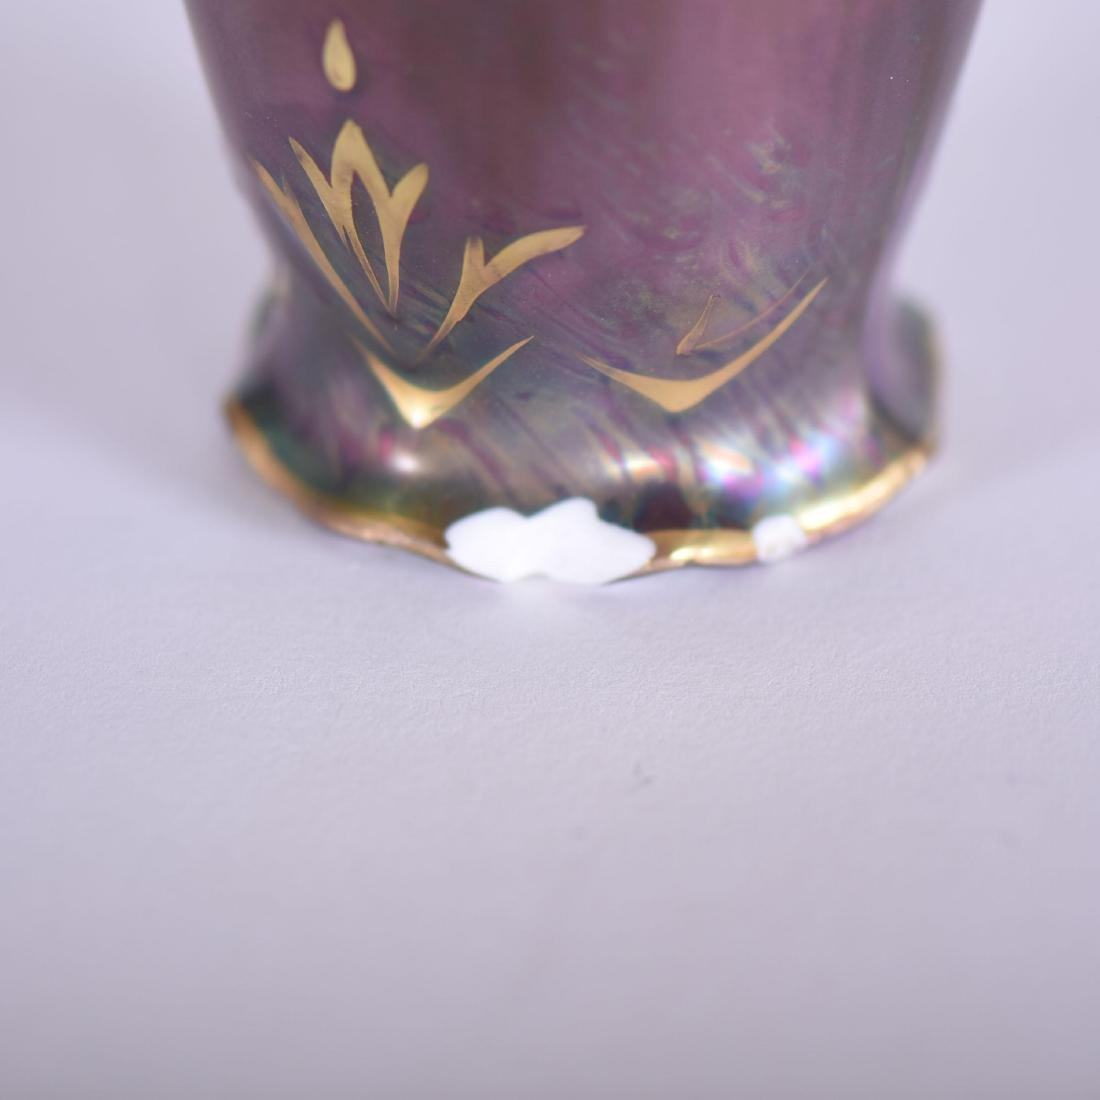 "Vase - Royal Vienna Mark - 7.5"" - 4"